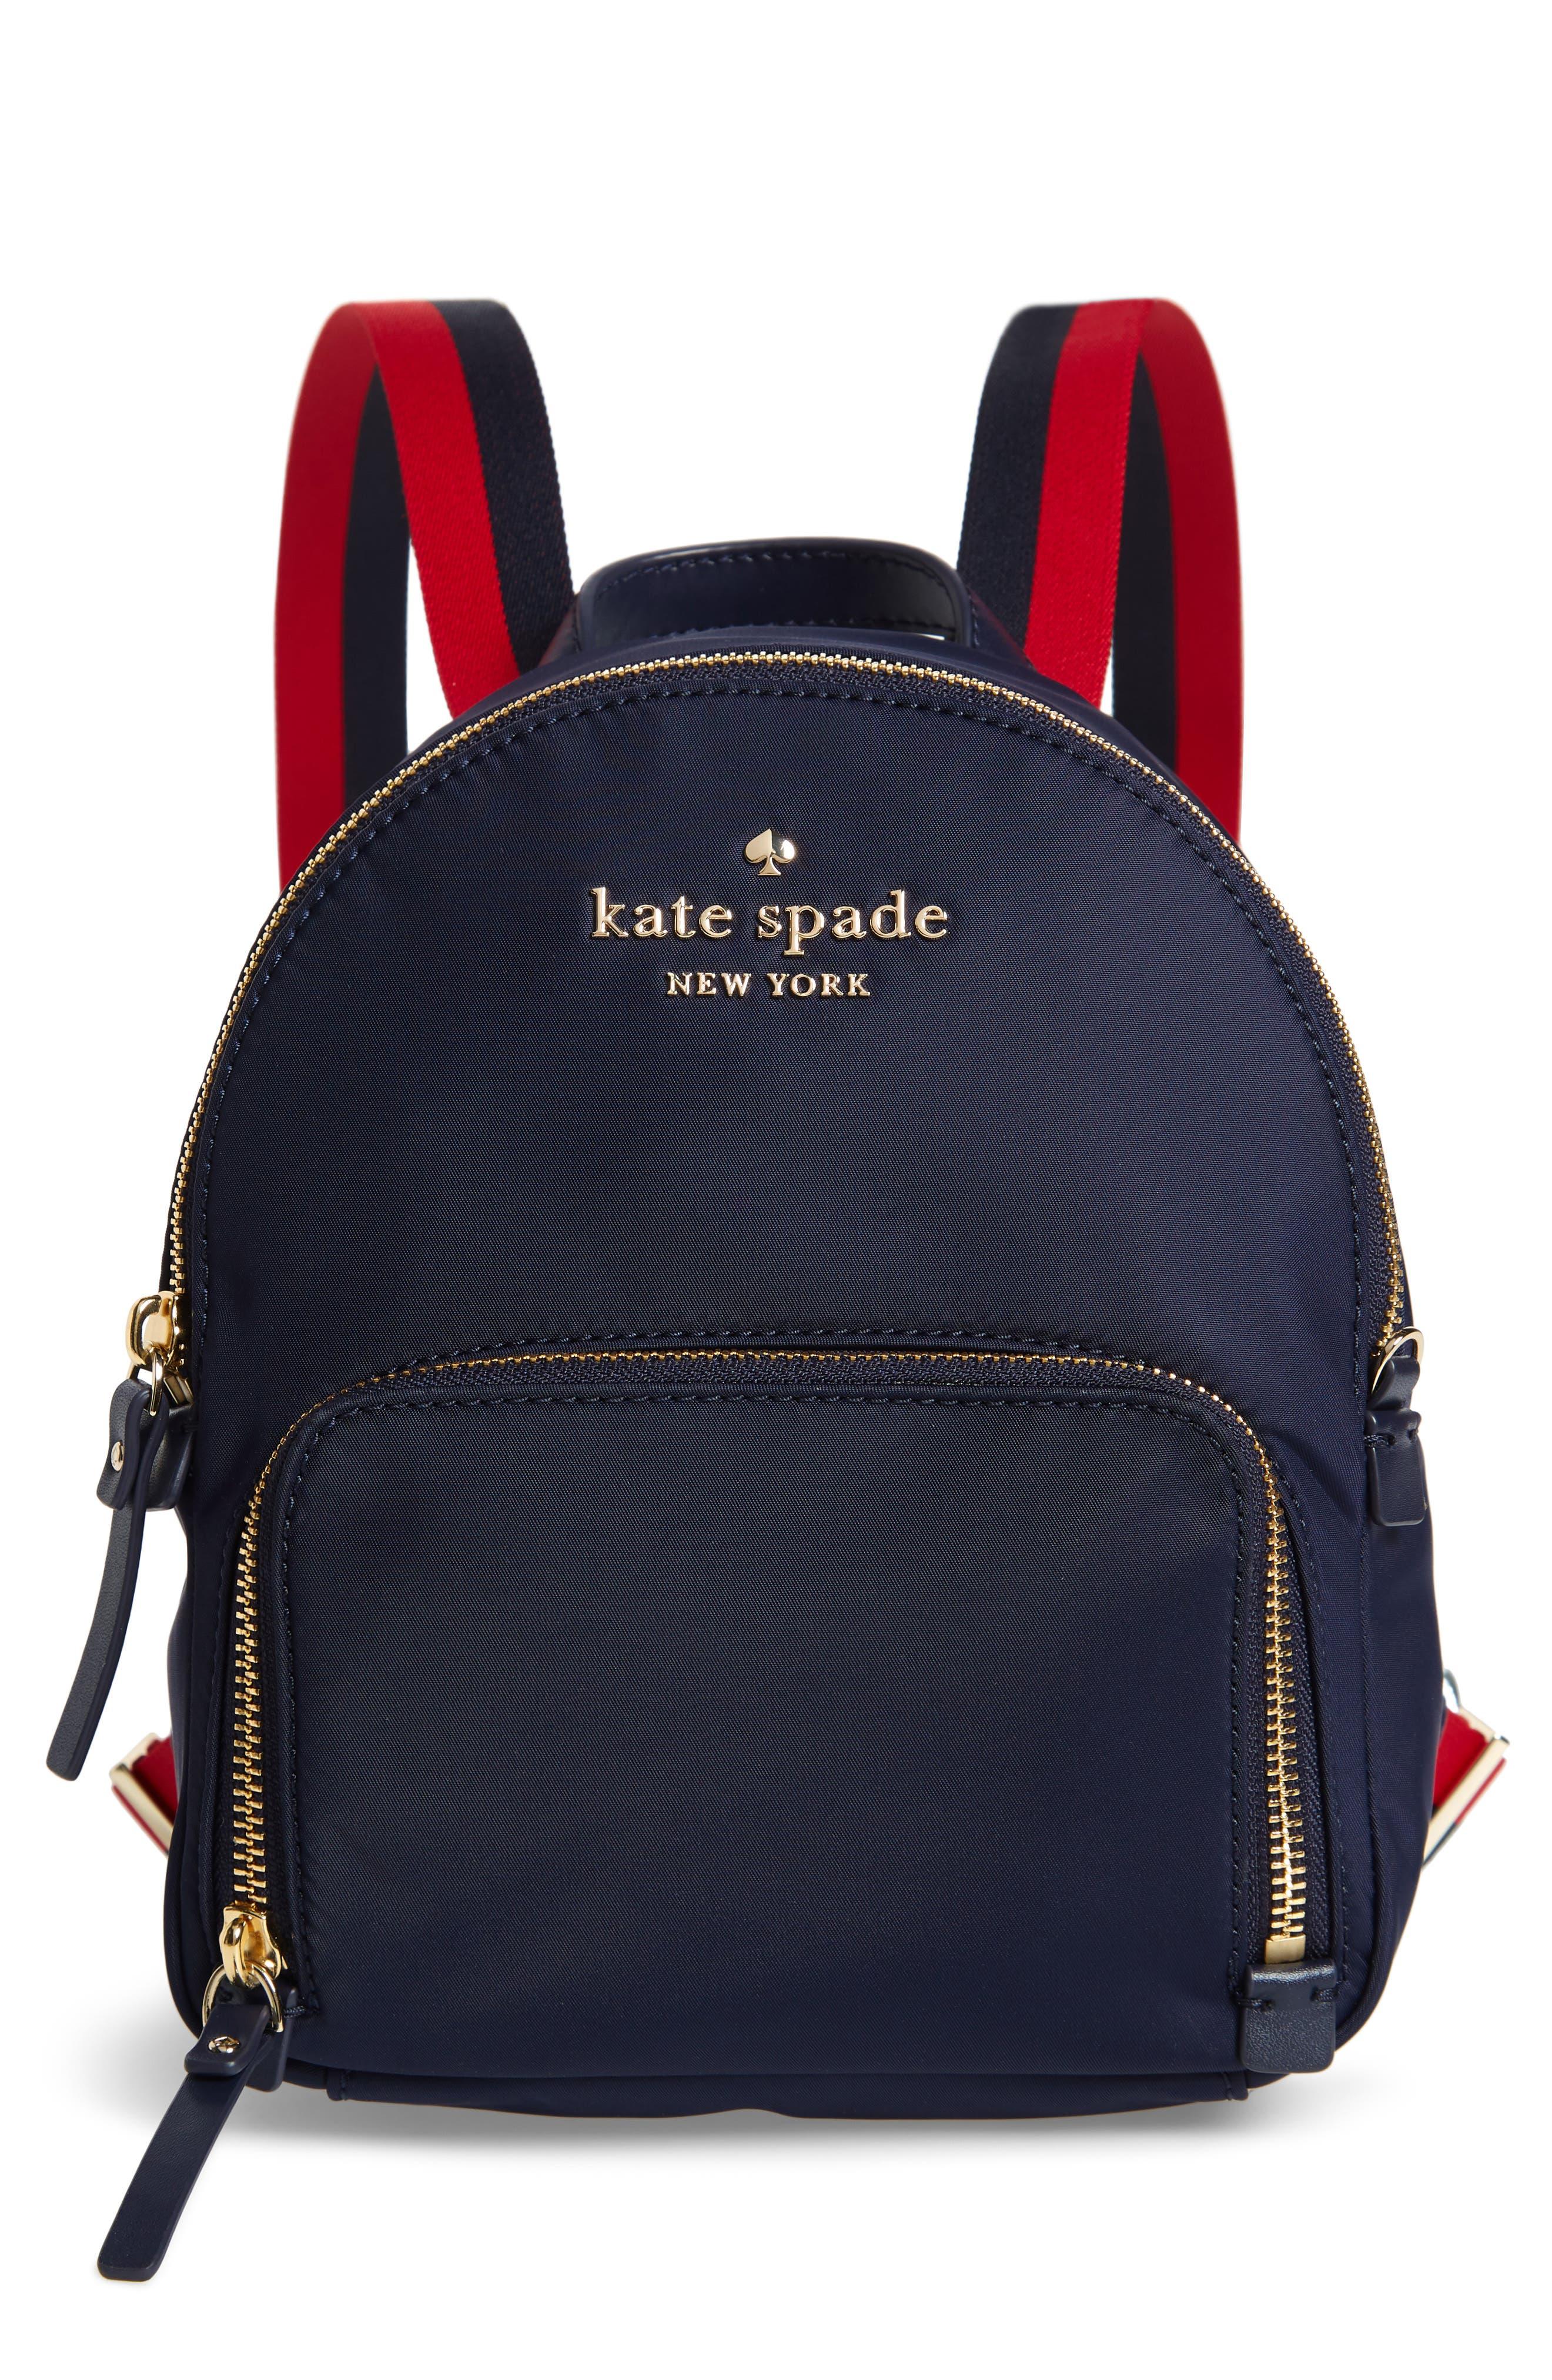 KATE SPADE NEW YORK,                             kate spade watson lane varsity stripe small backpack,                             Main thumbnail 1, color,                             400